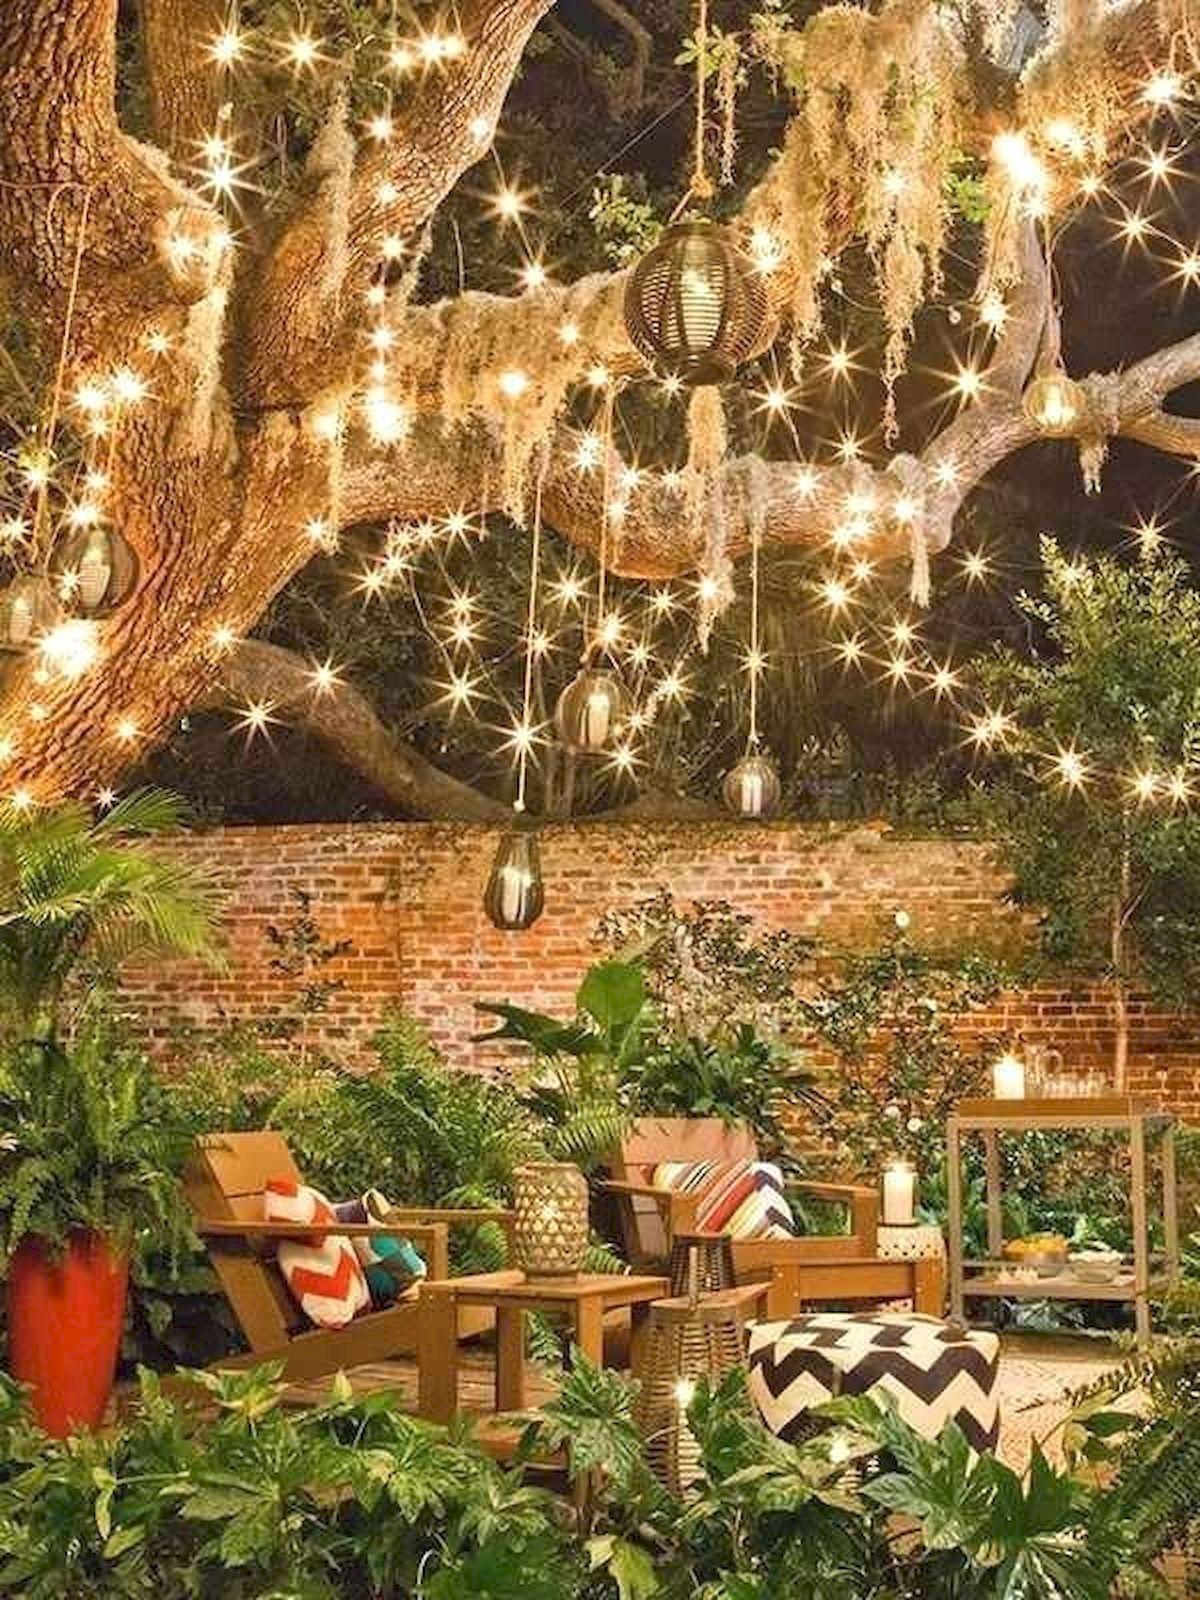 Decorating Outdoor Lighting OUTDOOR DECORATIONS